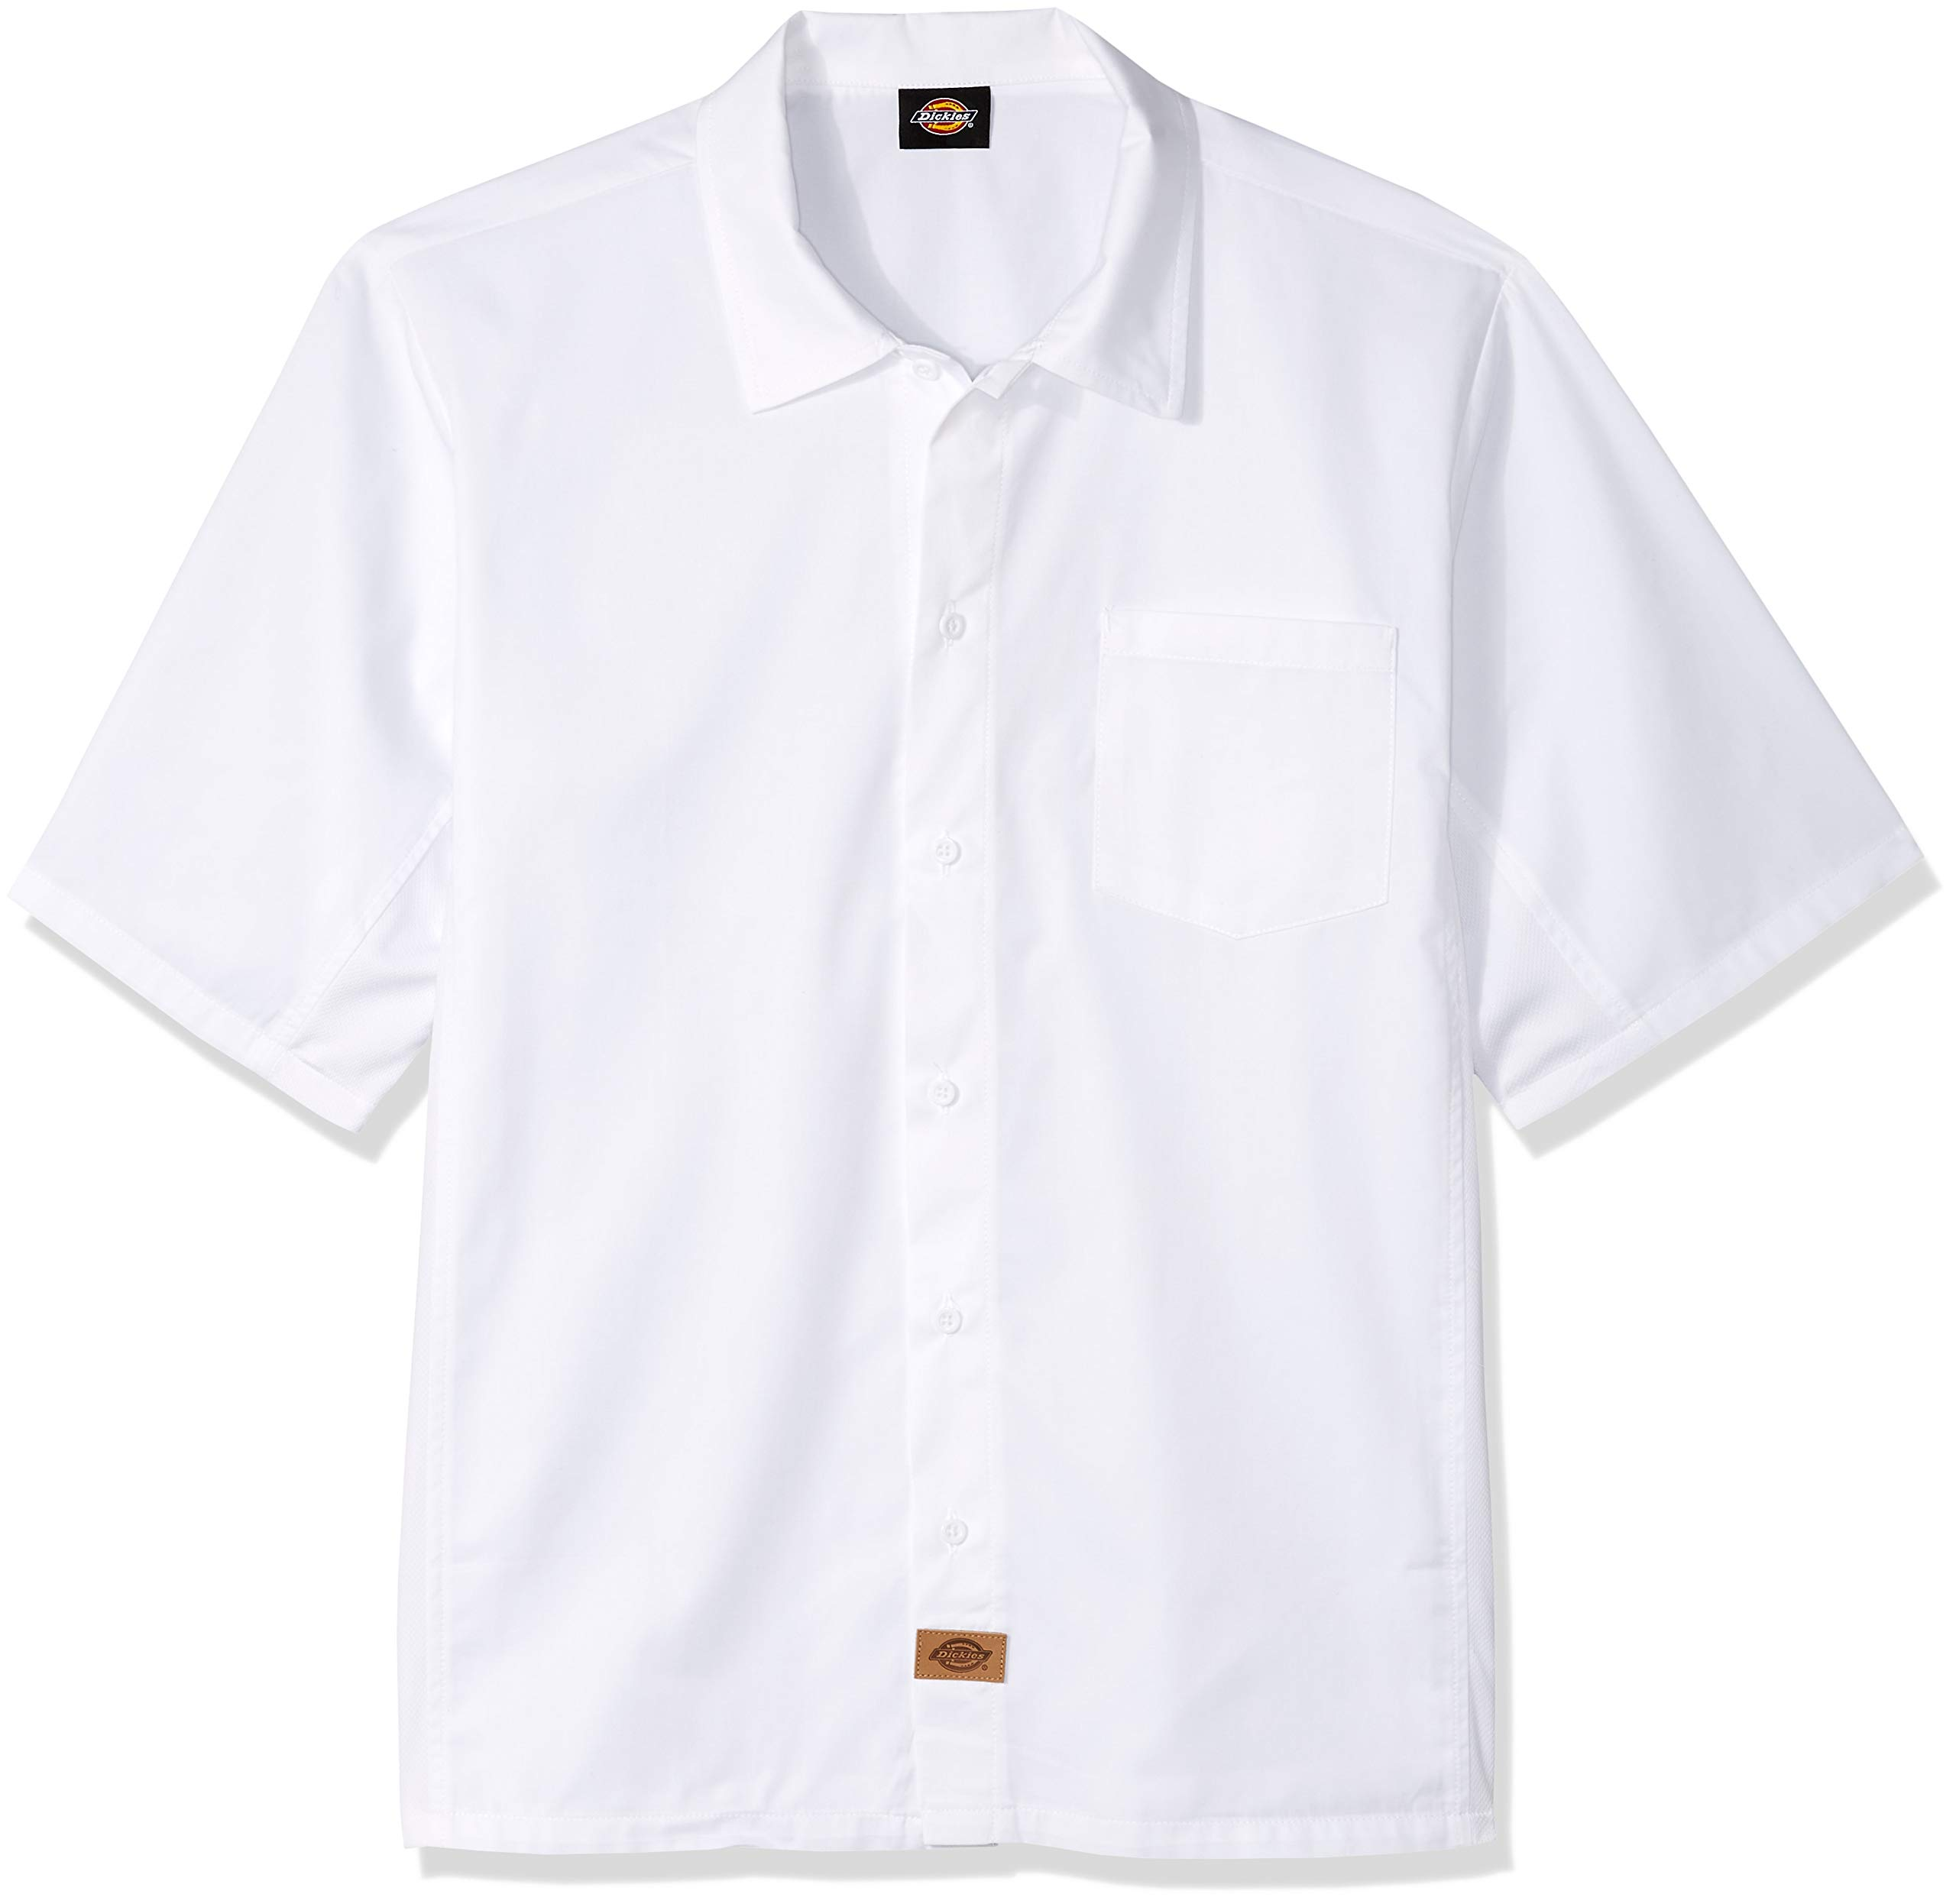 Dickies Women's Cool Breeze Chef Shirt